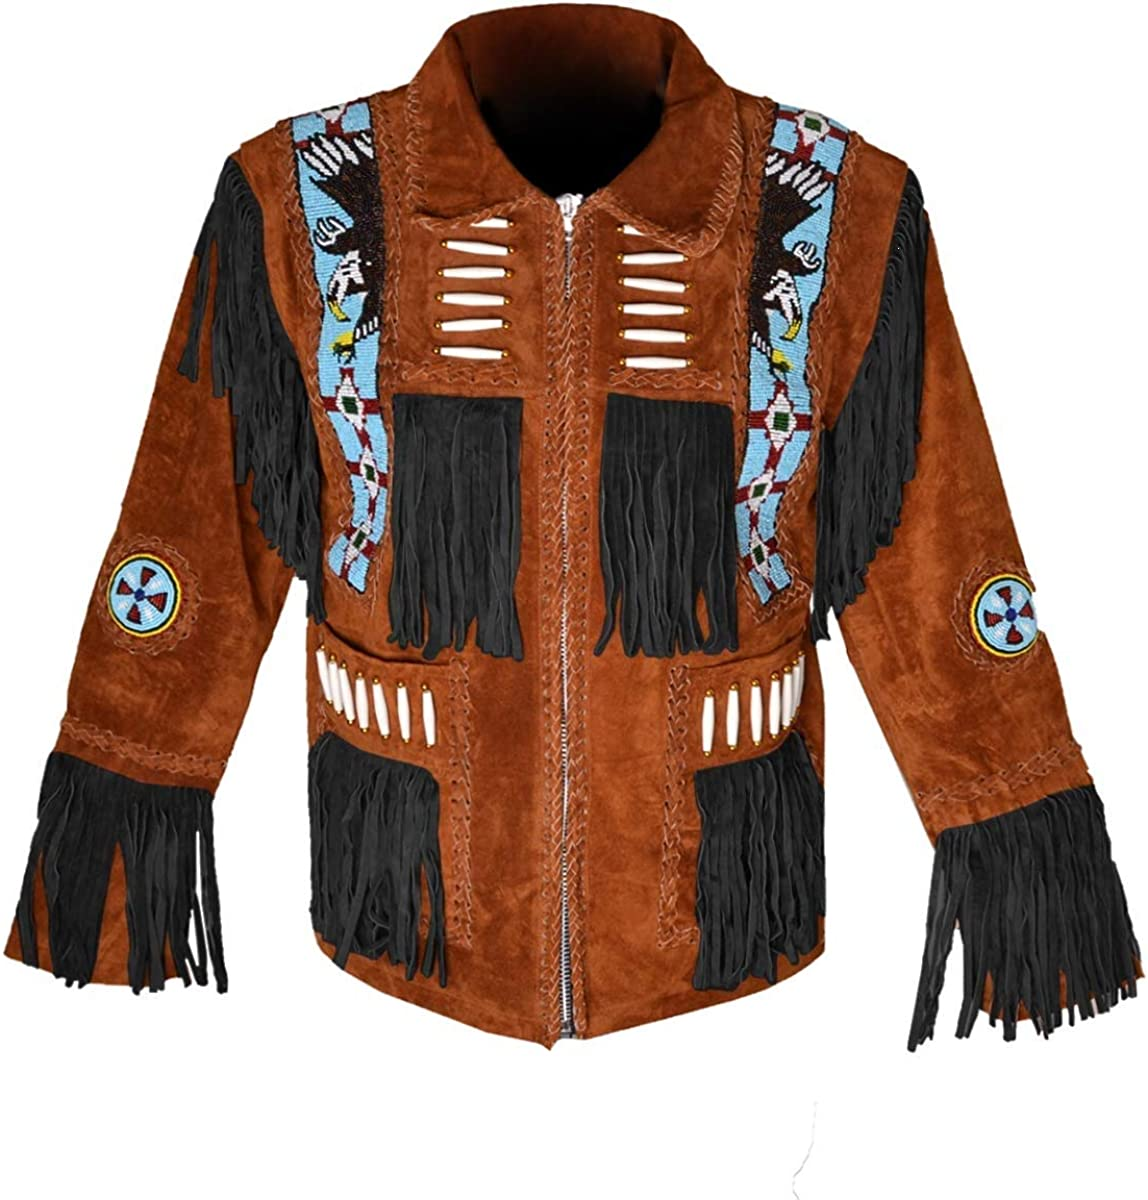 LEATHERAY Western Leather Jackets for Men Cowboy Leather Jacket and Fringe Beaded Coat Suede Leather Shirt